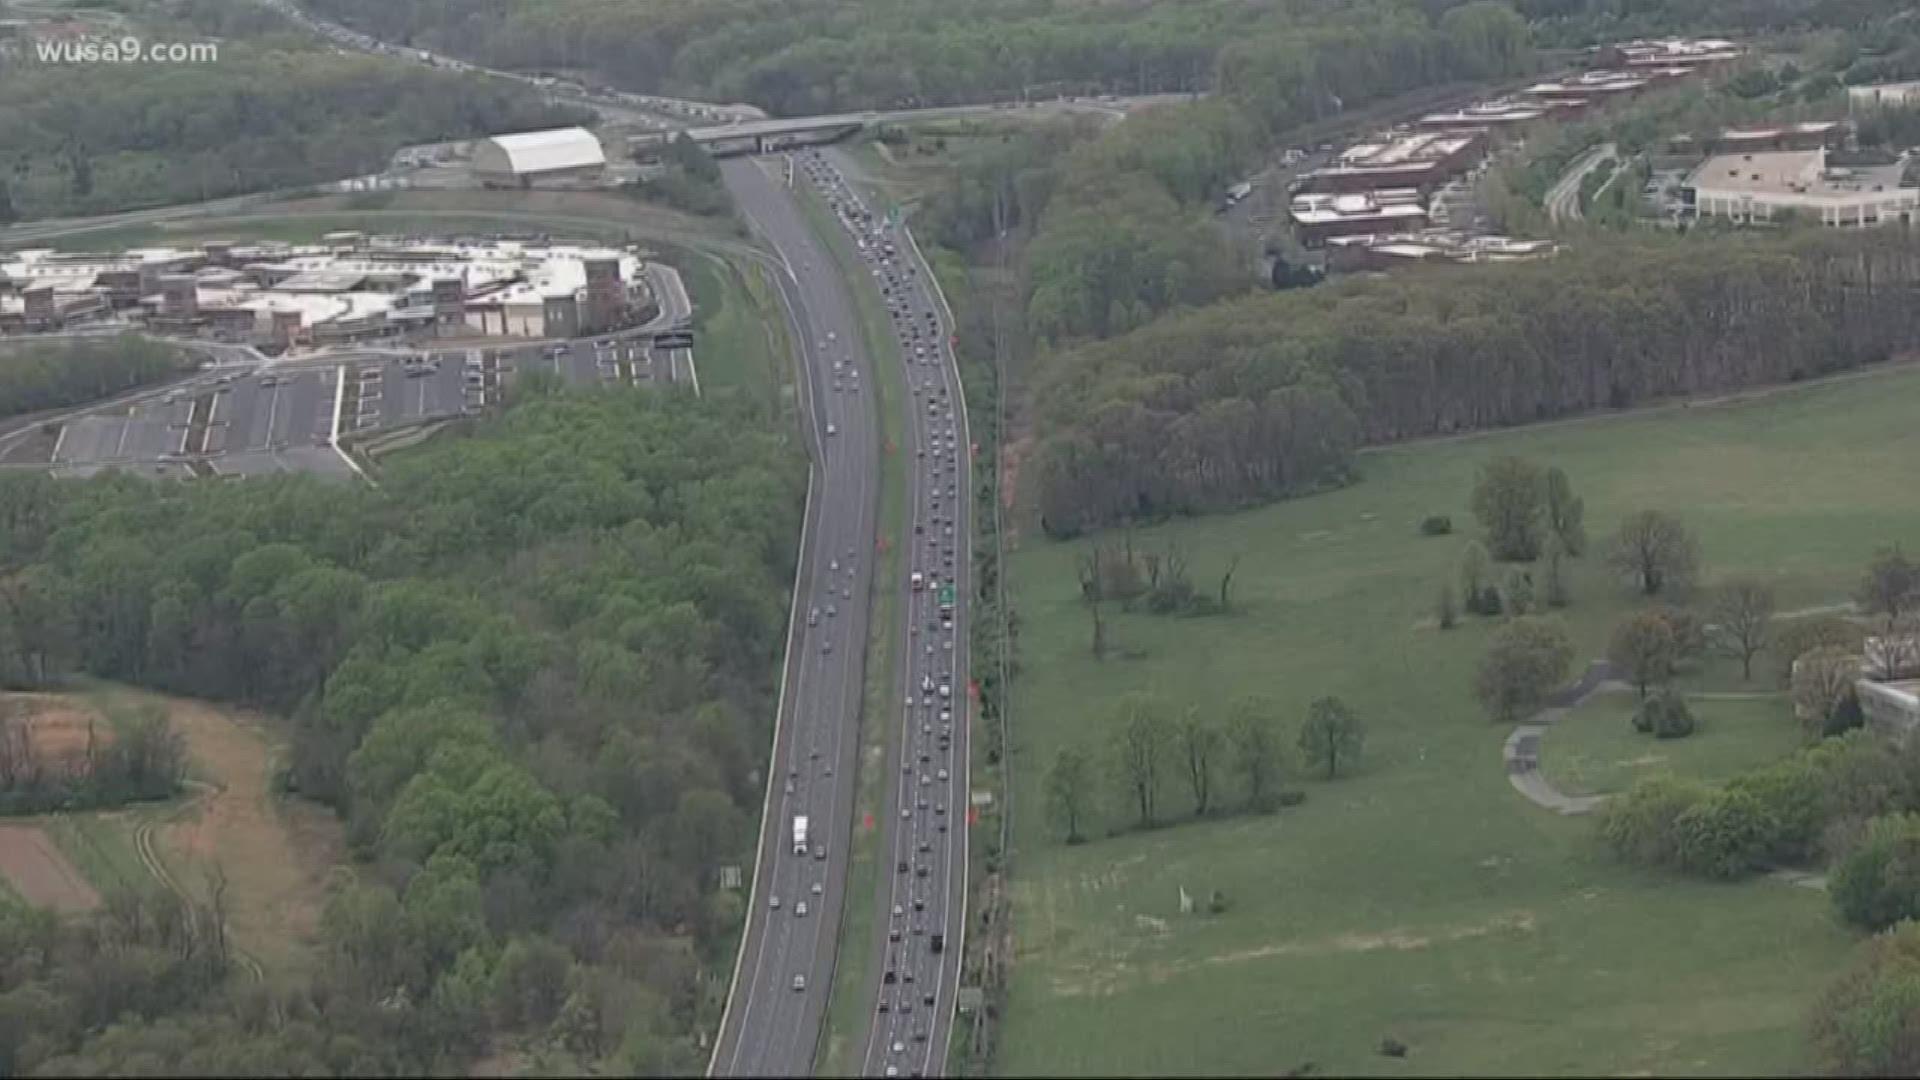 Hogan delays Beltway privatization toll plan to win approval for I-270 improvements sooner